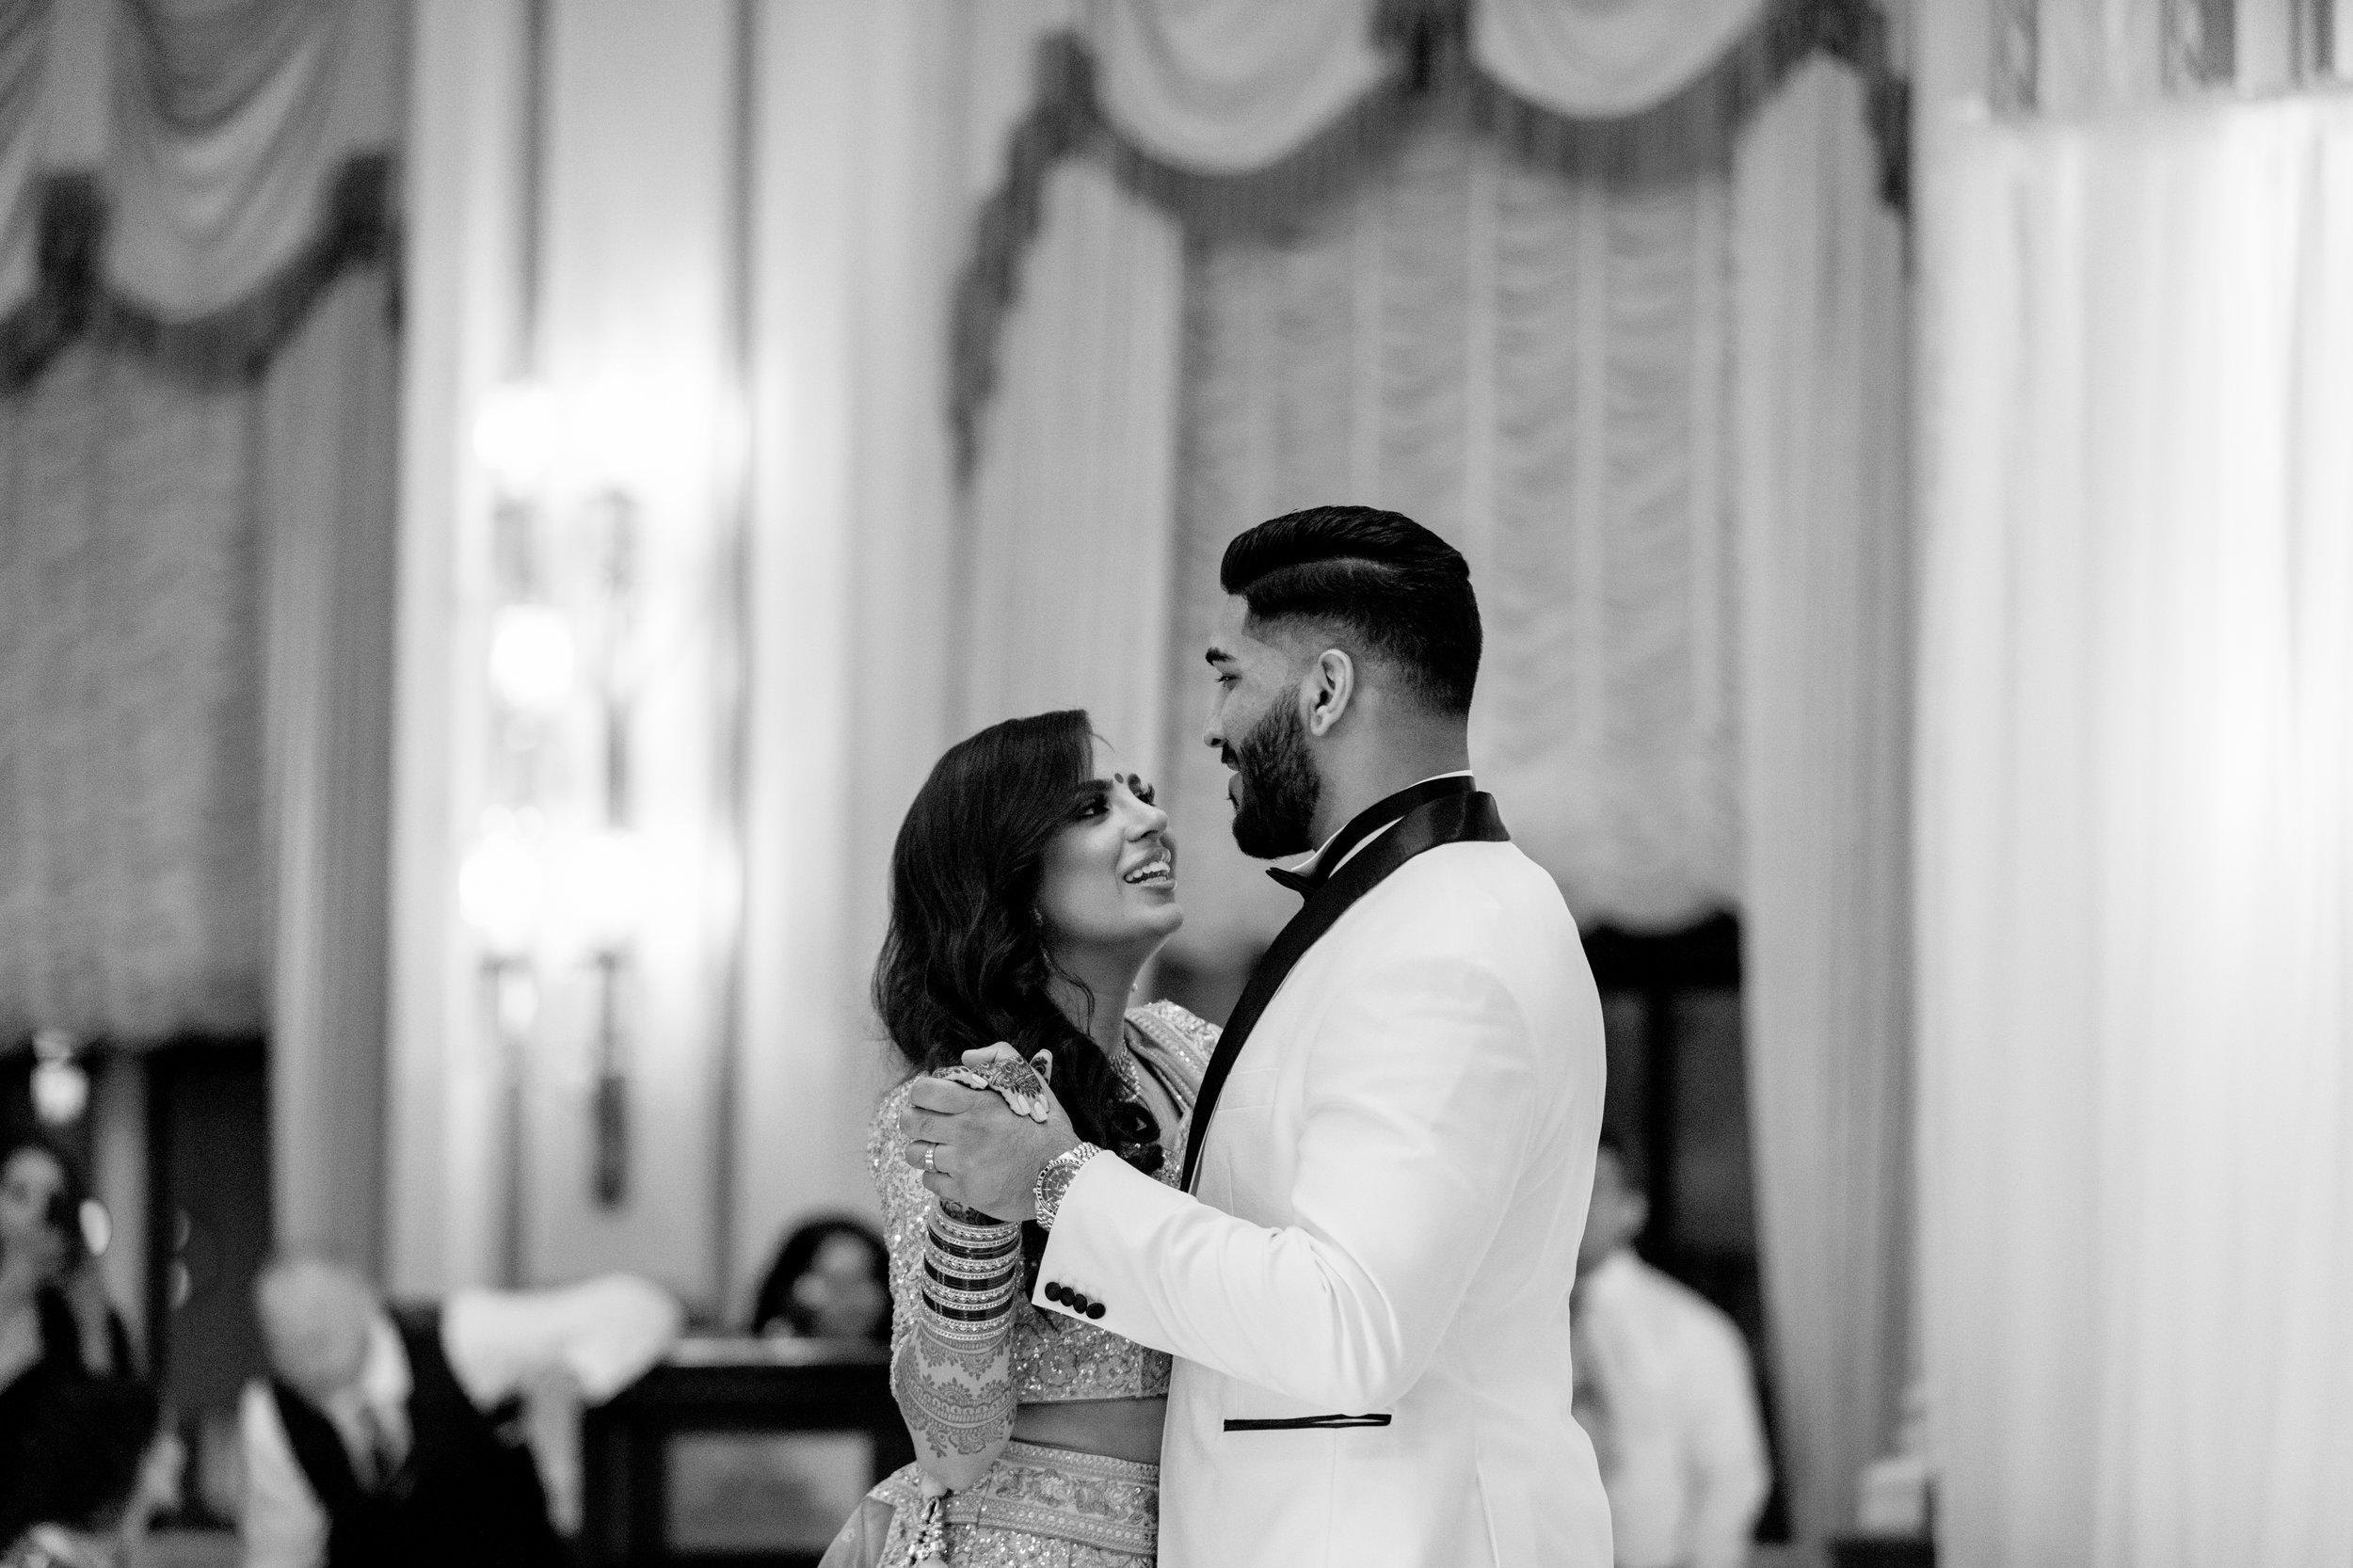 herastudios_wedding_aneesha_kris_hera_selects-70.jpg